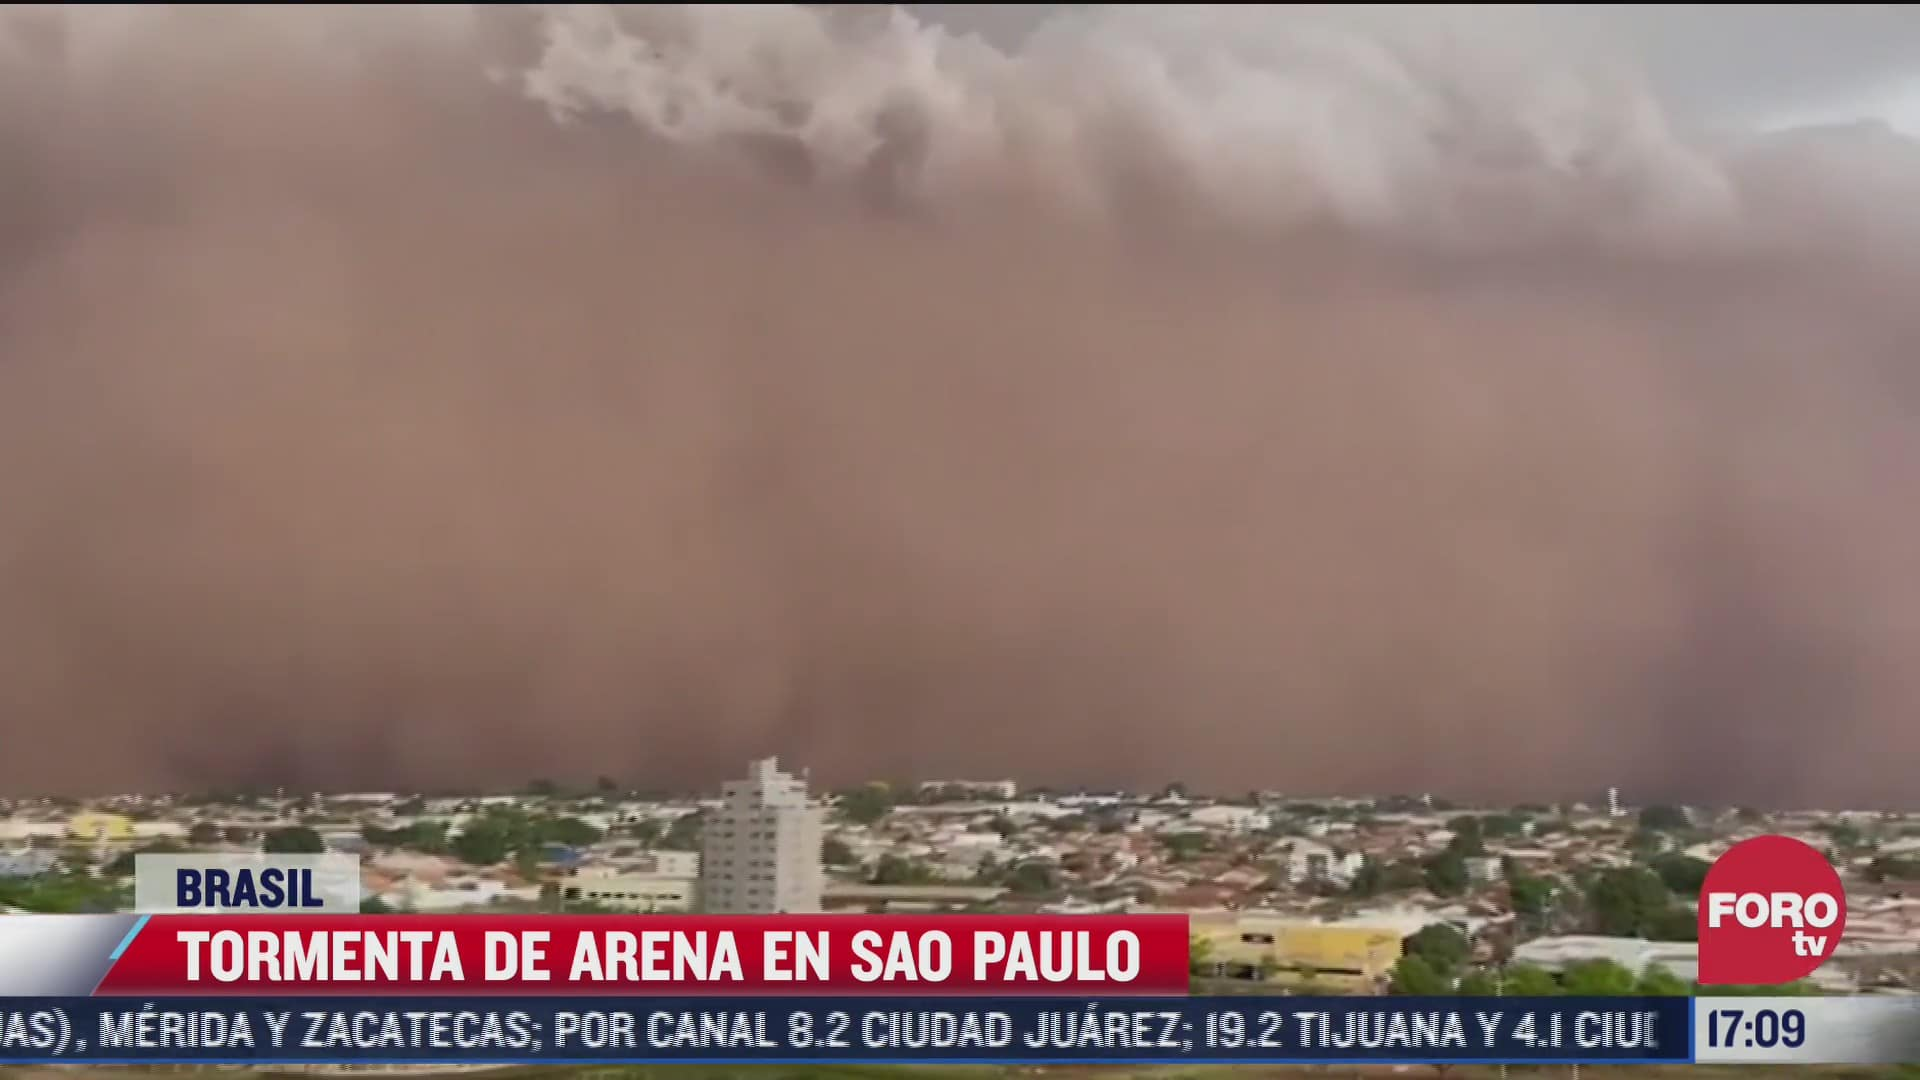 impactante tormenta de arena en brasil